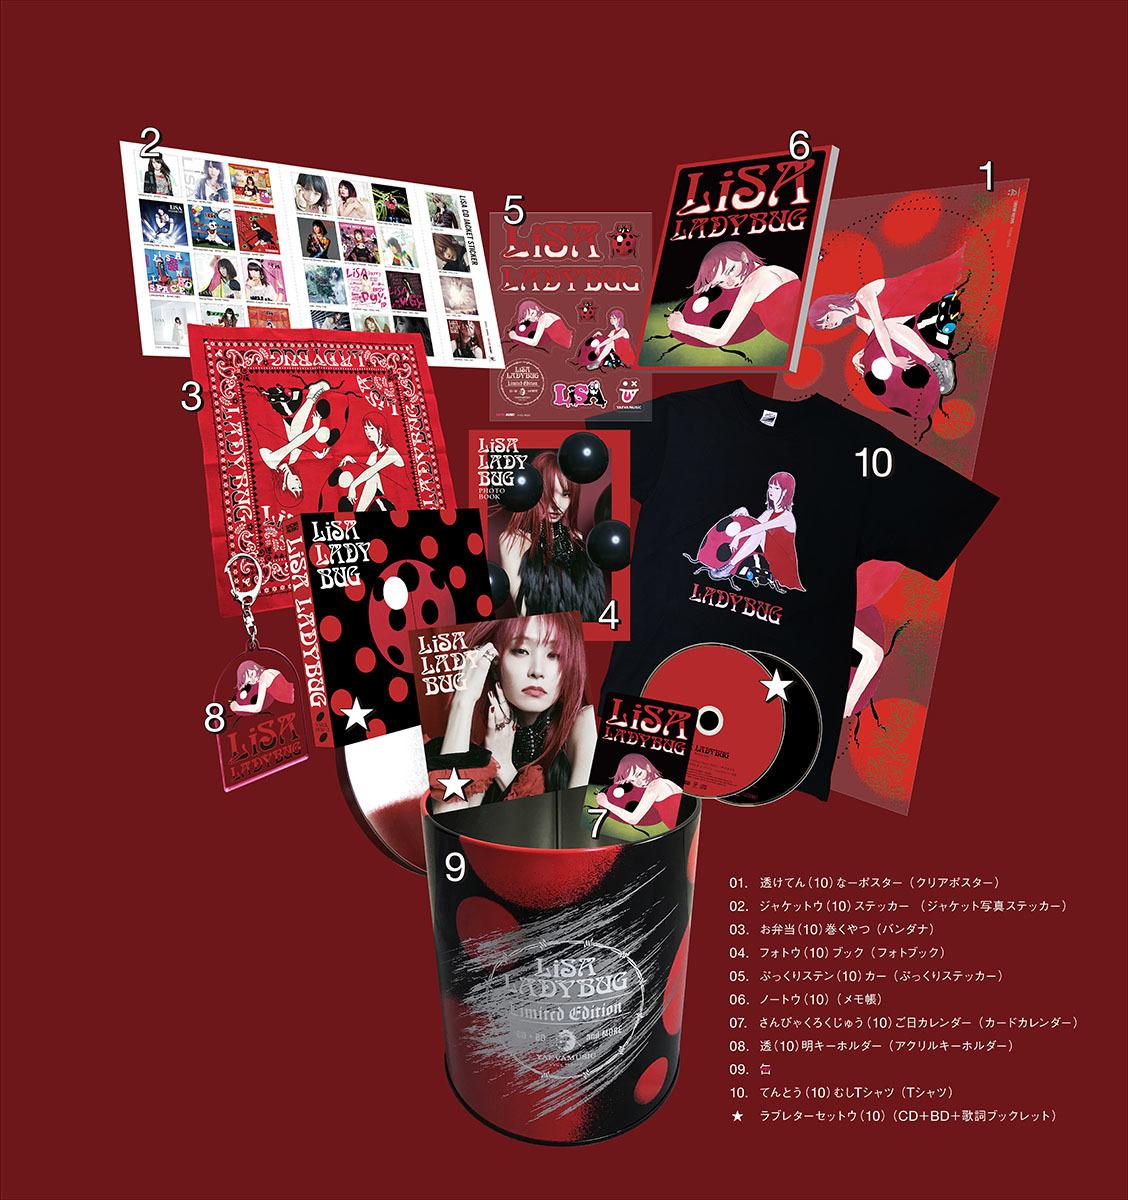 LiSAデビュー10周年ミニアルバム『LADYBUG』完全数量生産限定盤